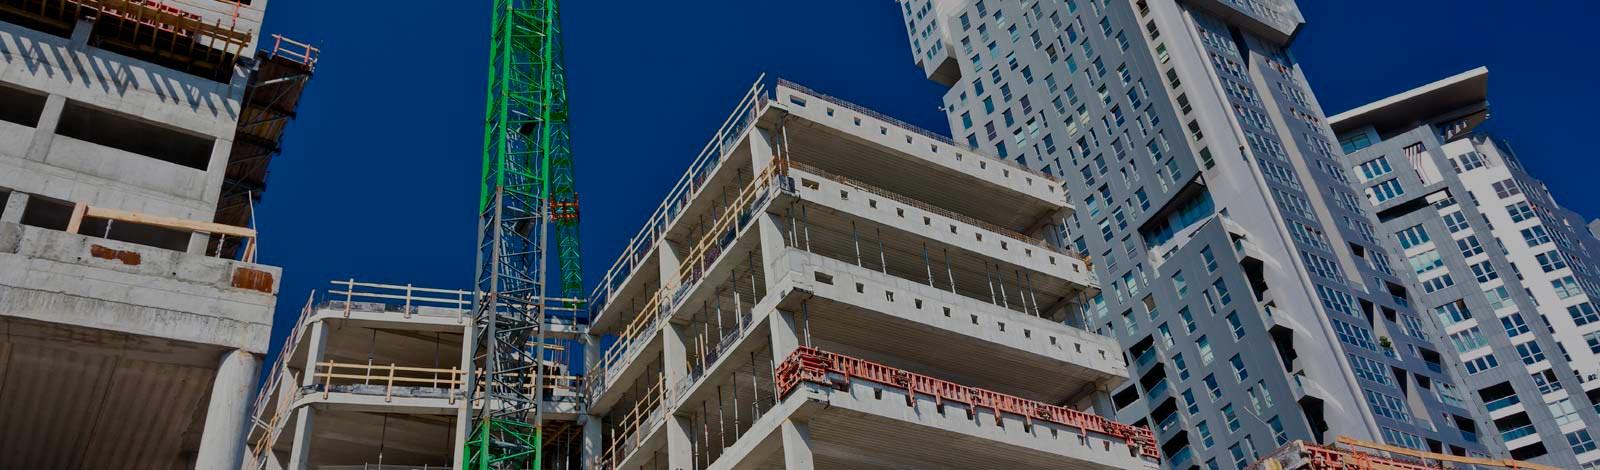 major construction project